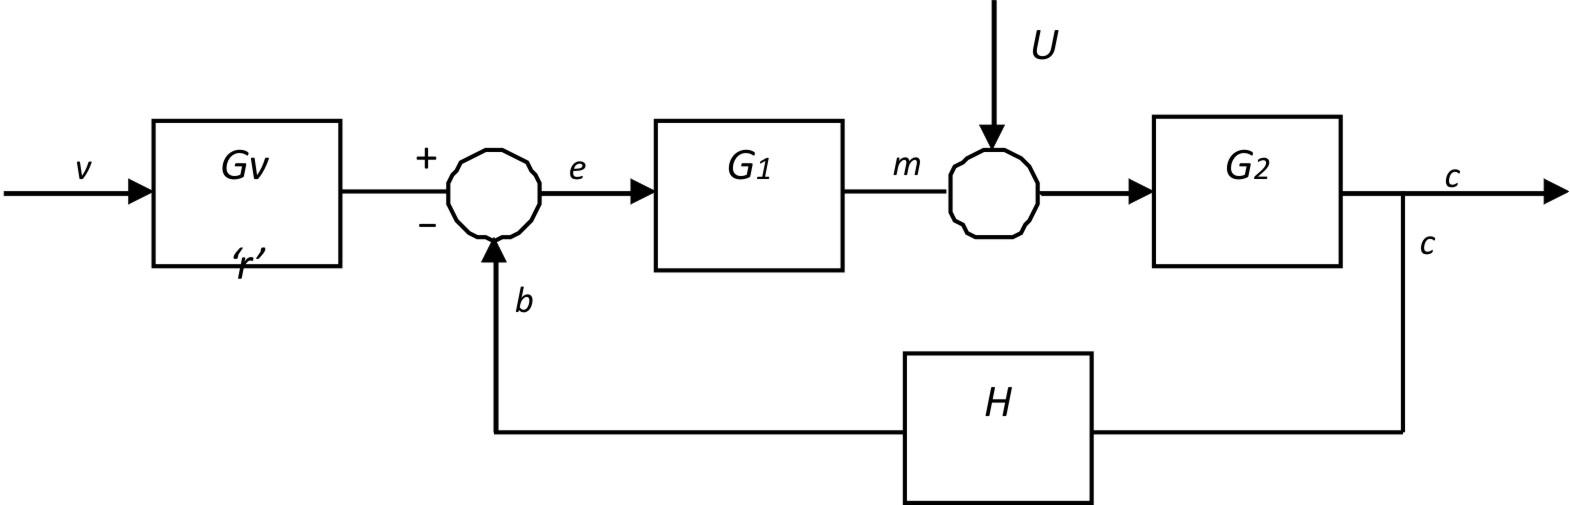 Unusual blok diagram images electrical system block diagram amazing blok diagram gallery electrical system block diagram ccuart Gallery